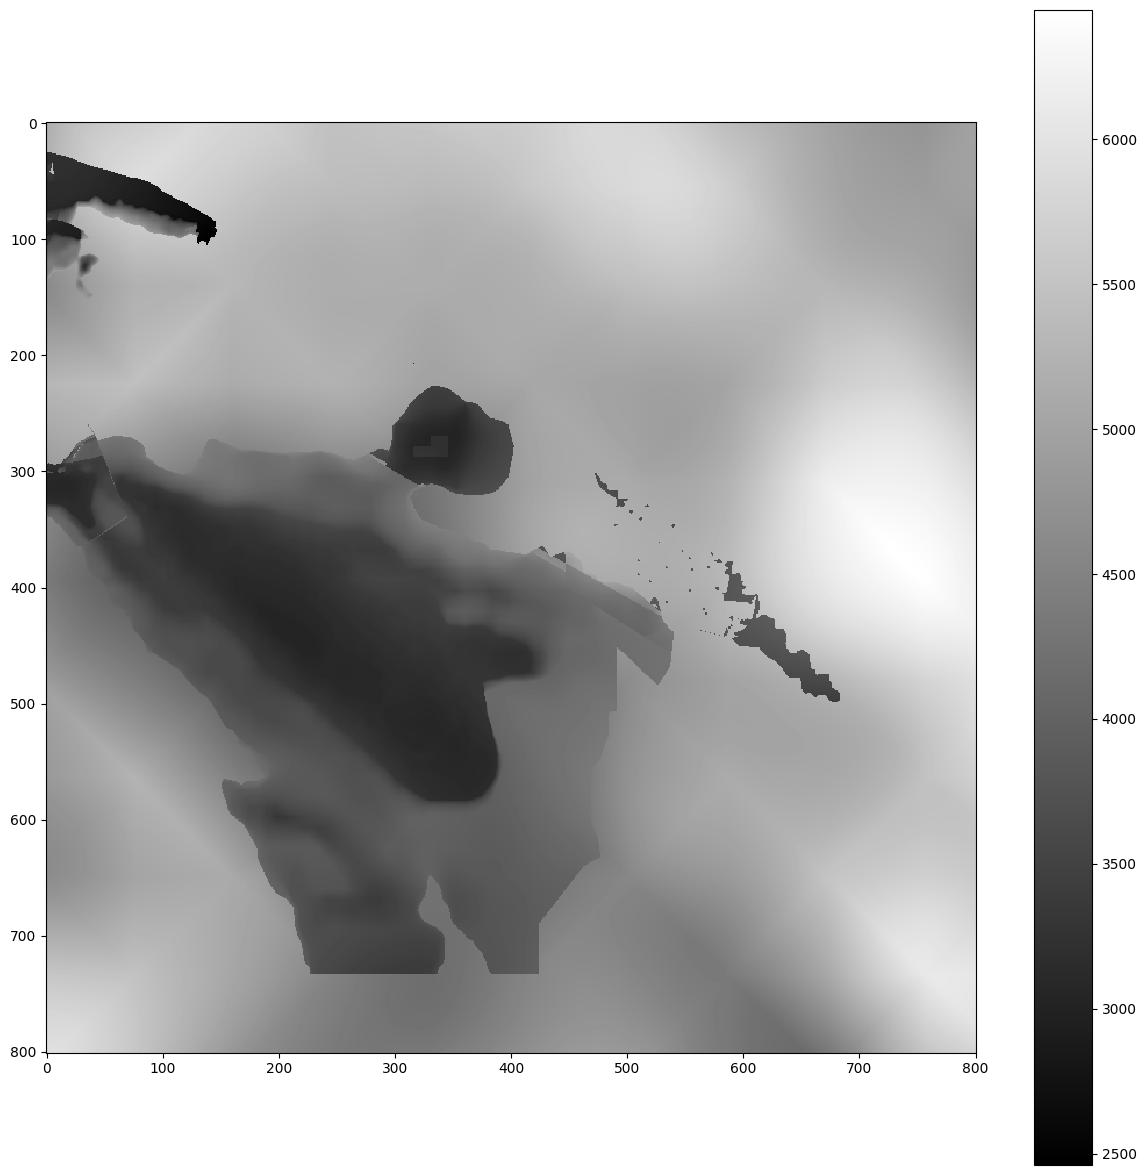 bench/seismic/wp/la_habra/meshes/velocity_model/plots/vp_2500.png